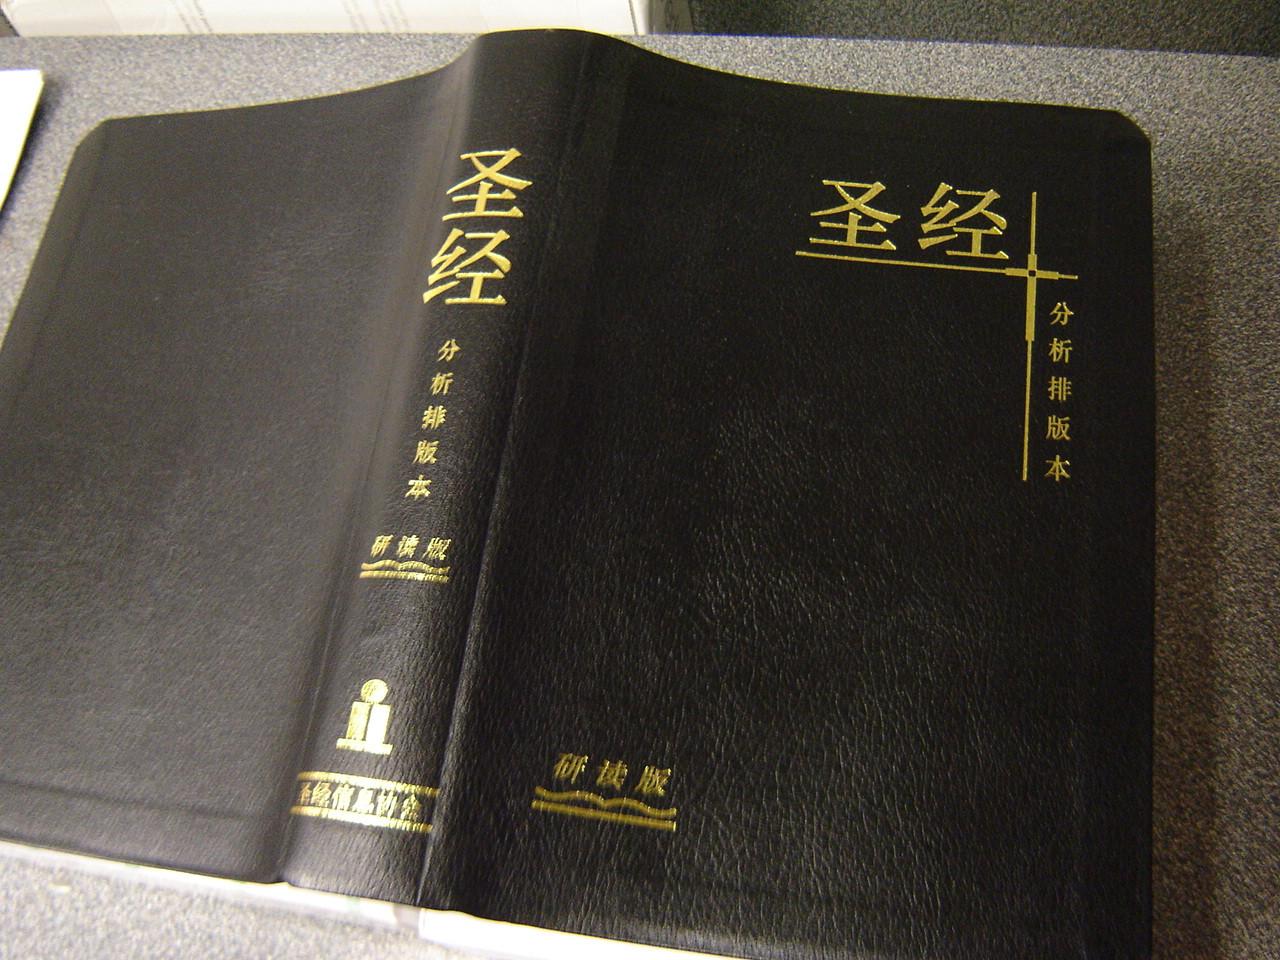 Essential Tools for Bible Study - c317808.r8.cf1.rackcdn.com